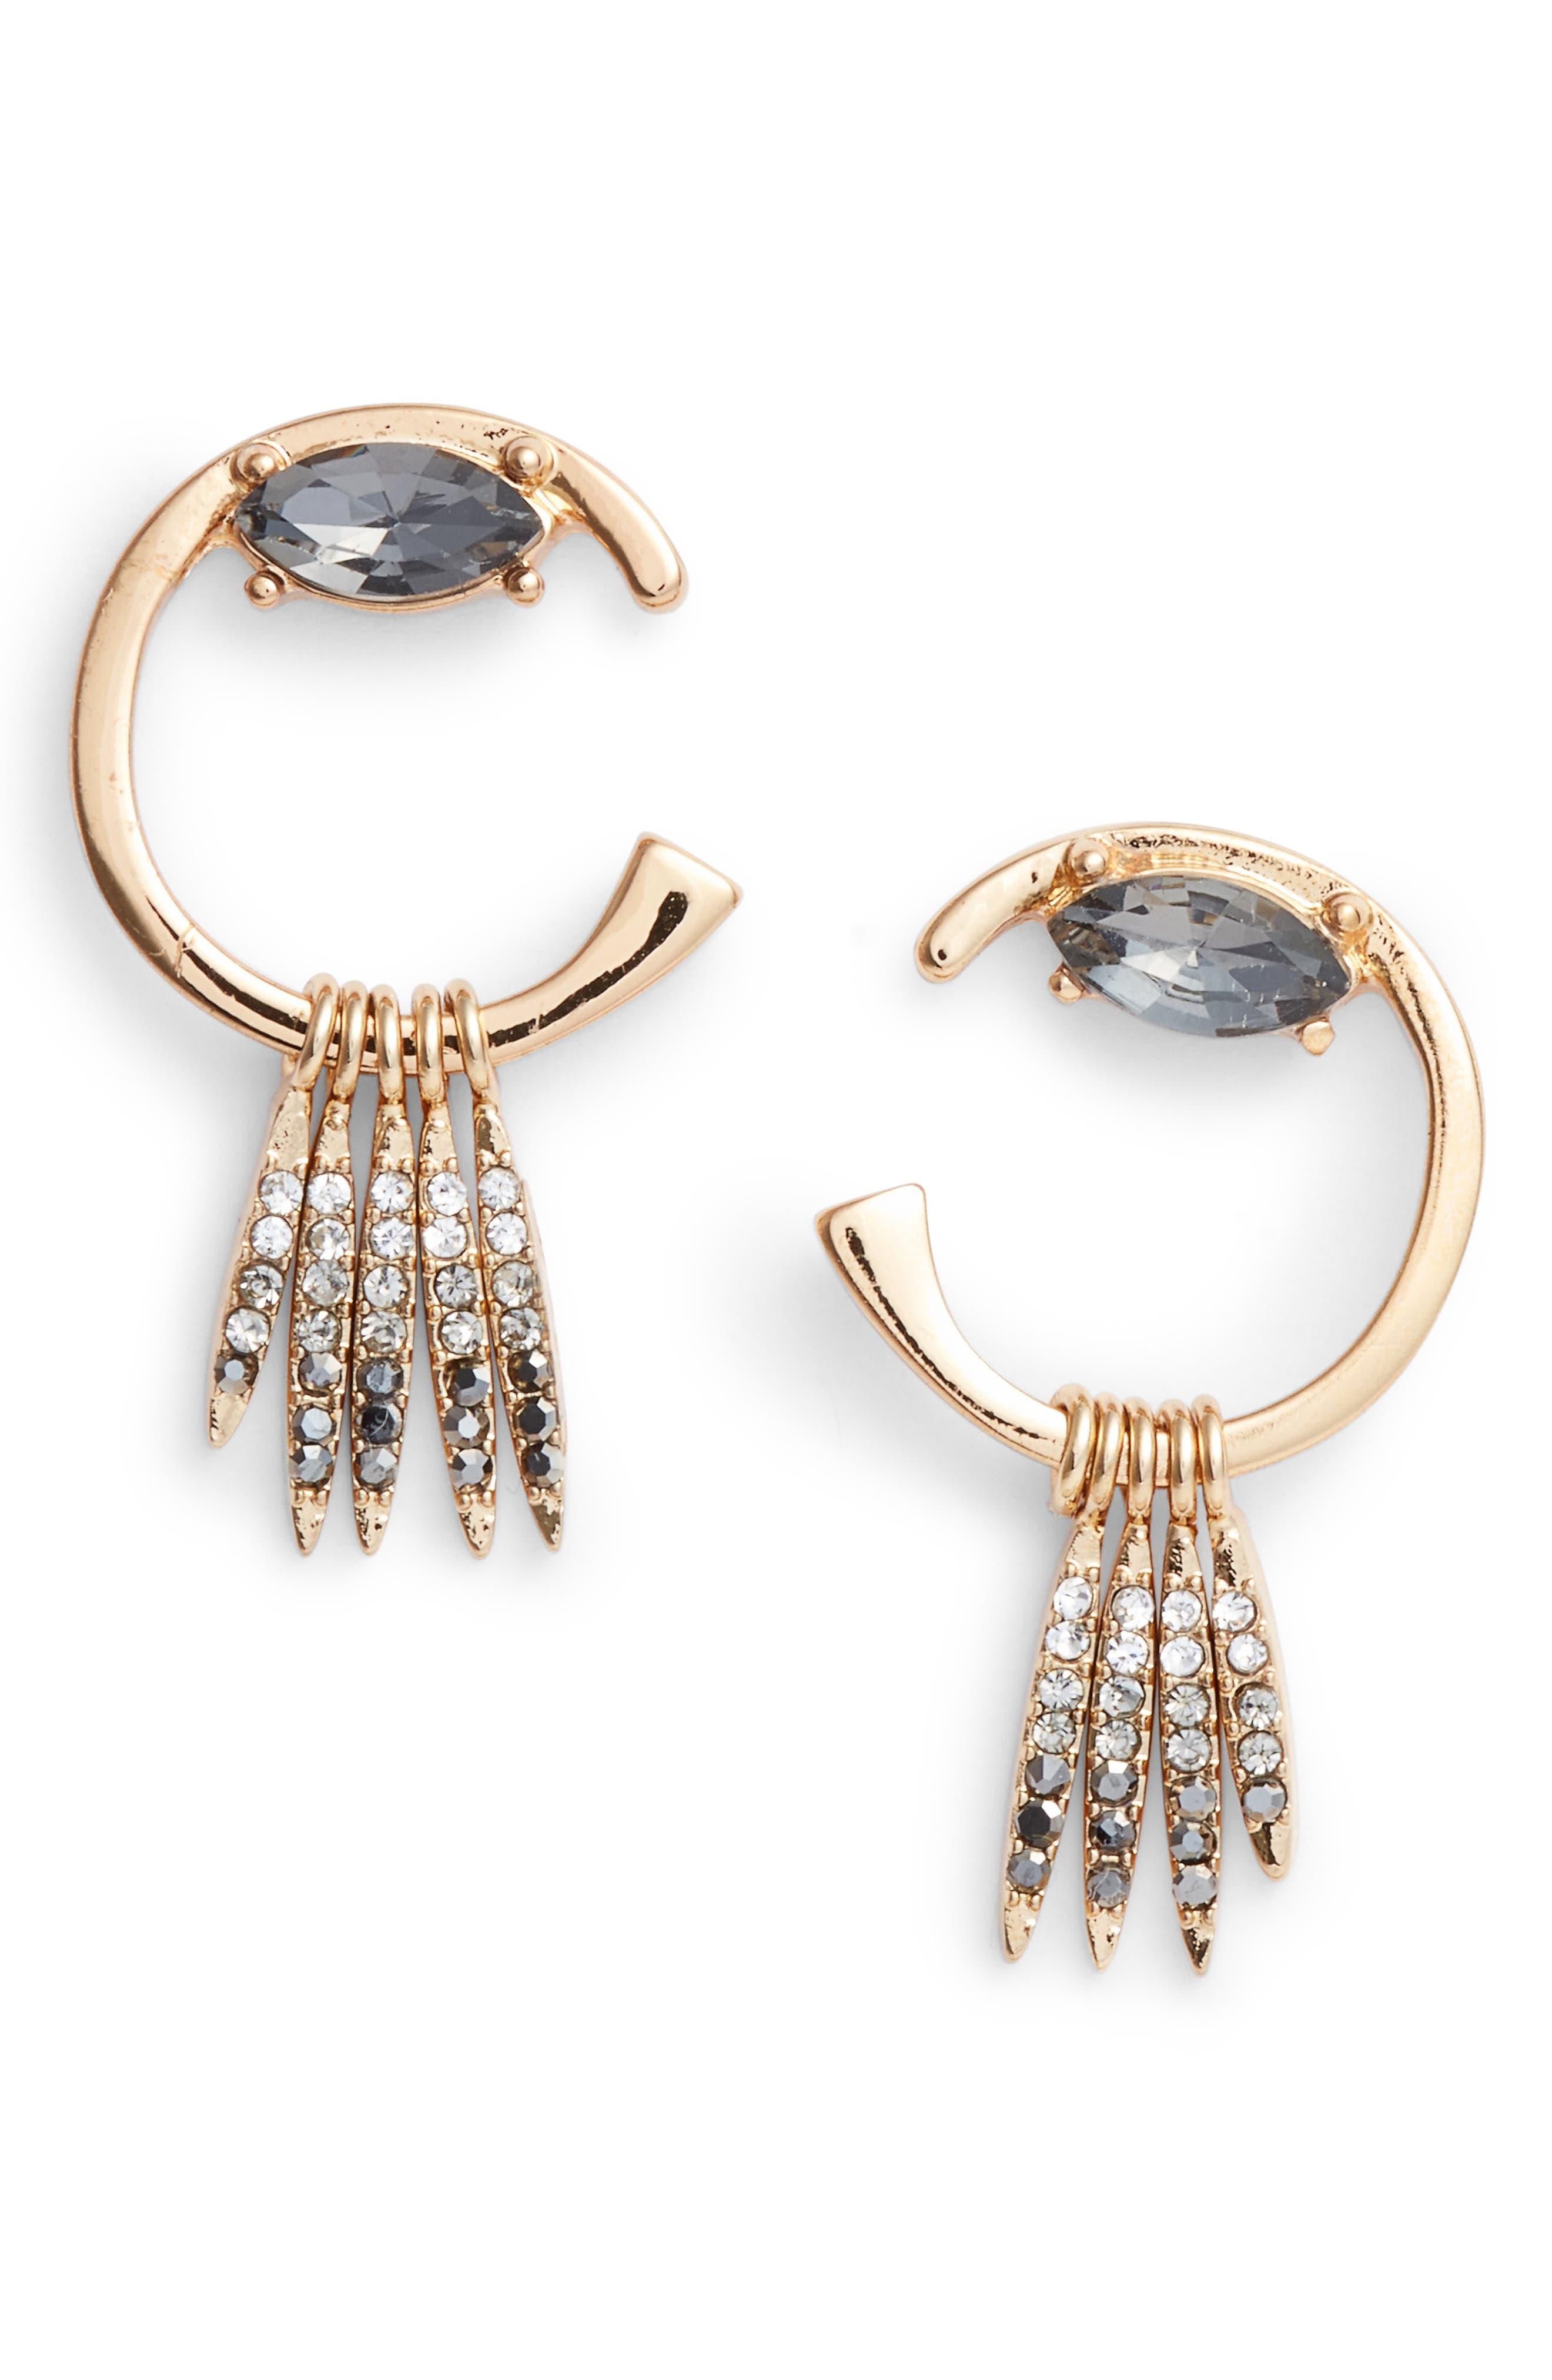 Rebecca Minkoff Peyton Deco Earrings